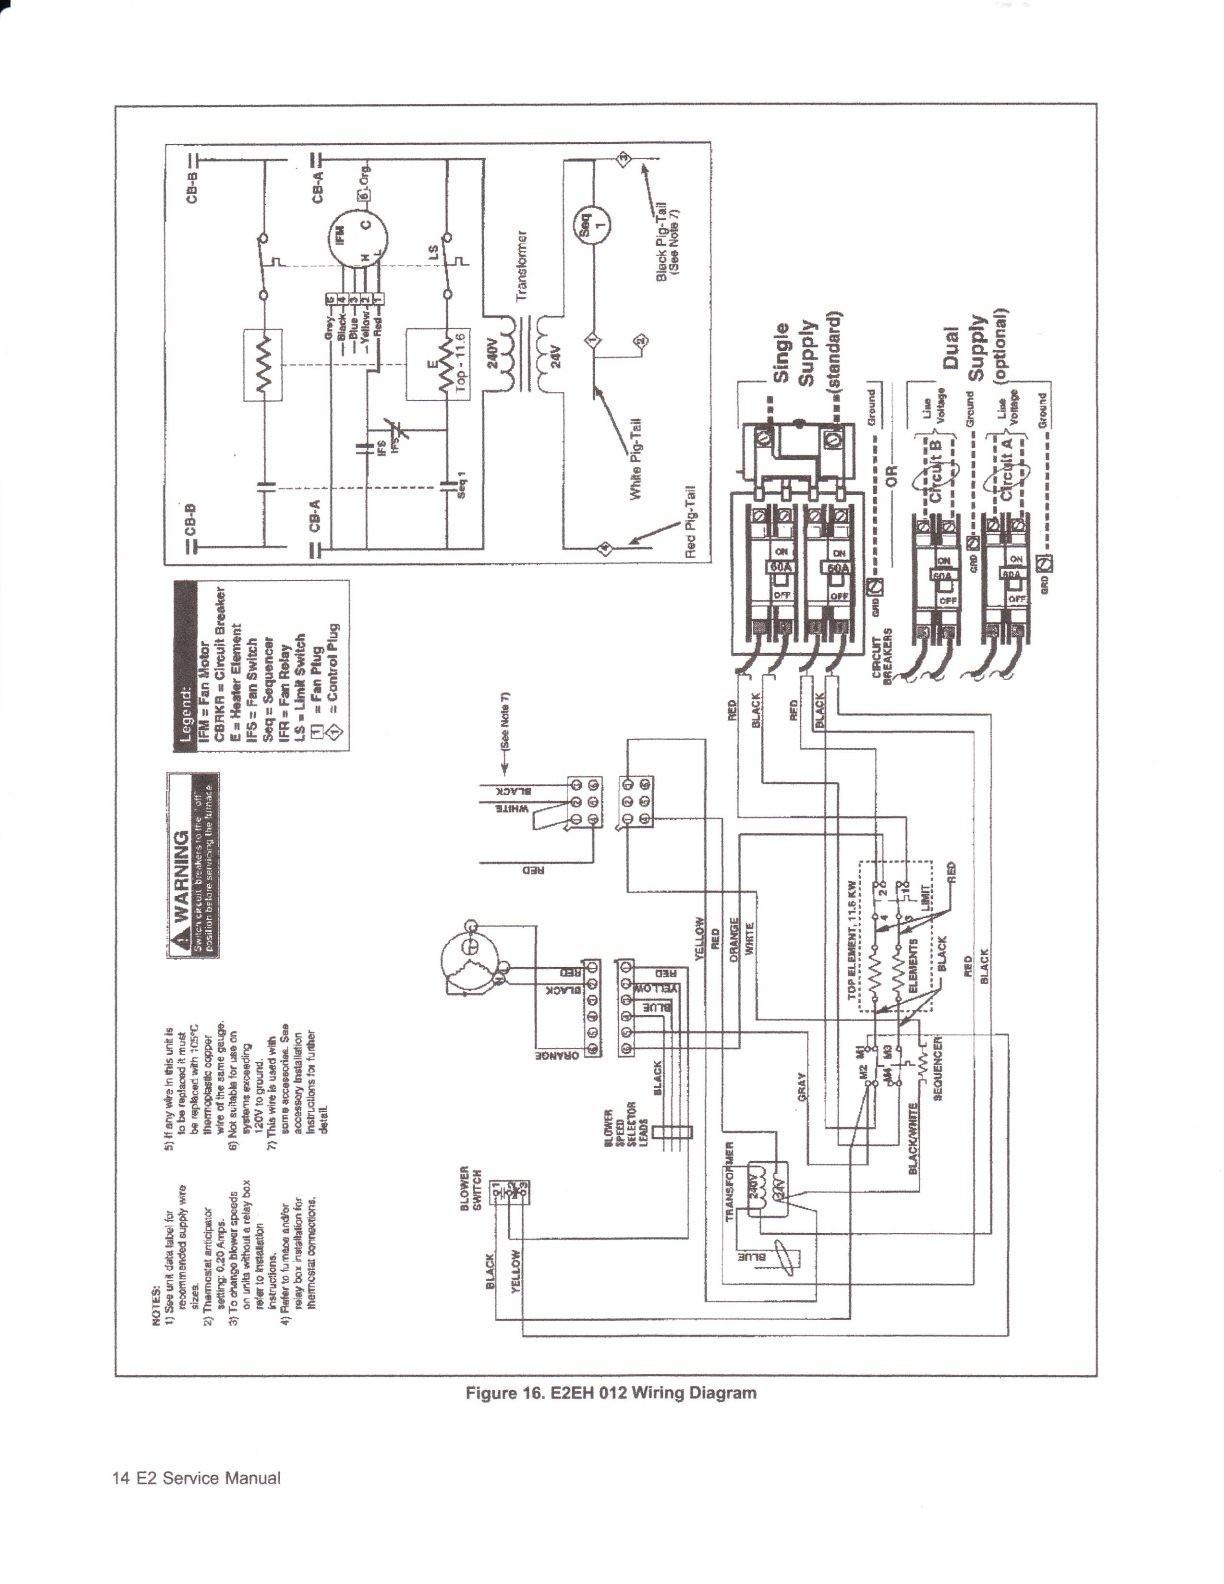 Electric Furnace Wiring Diagram Sequencer Elegant Magnificent Miller